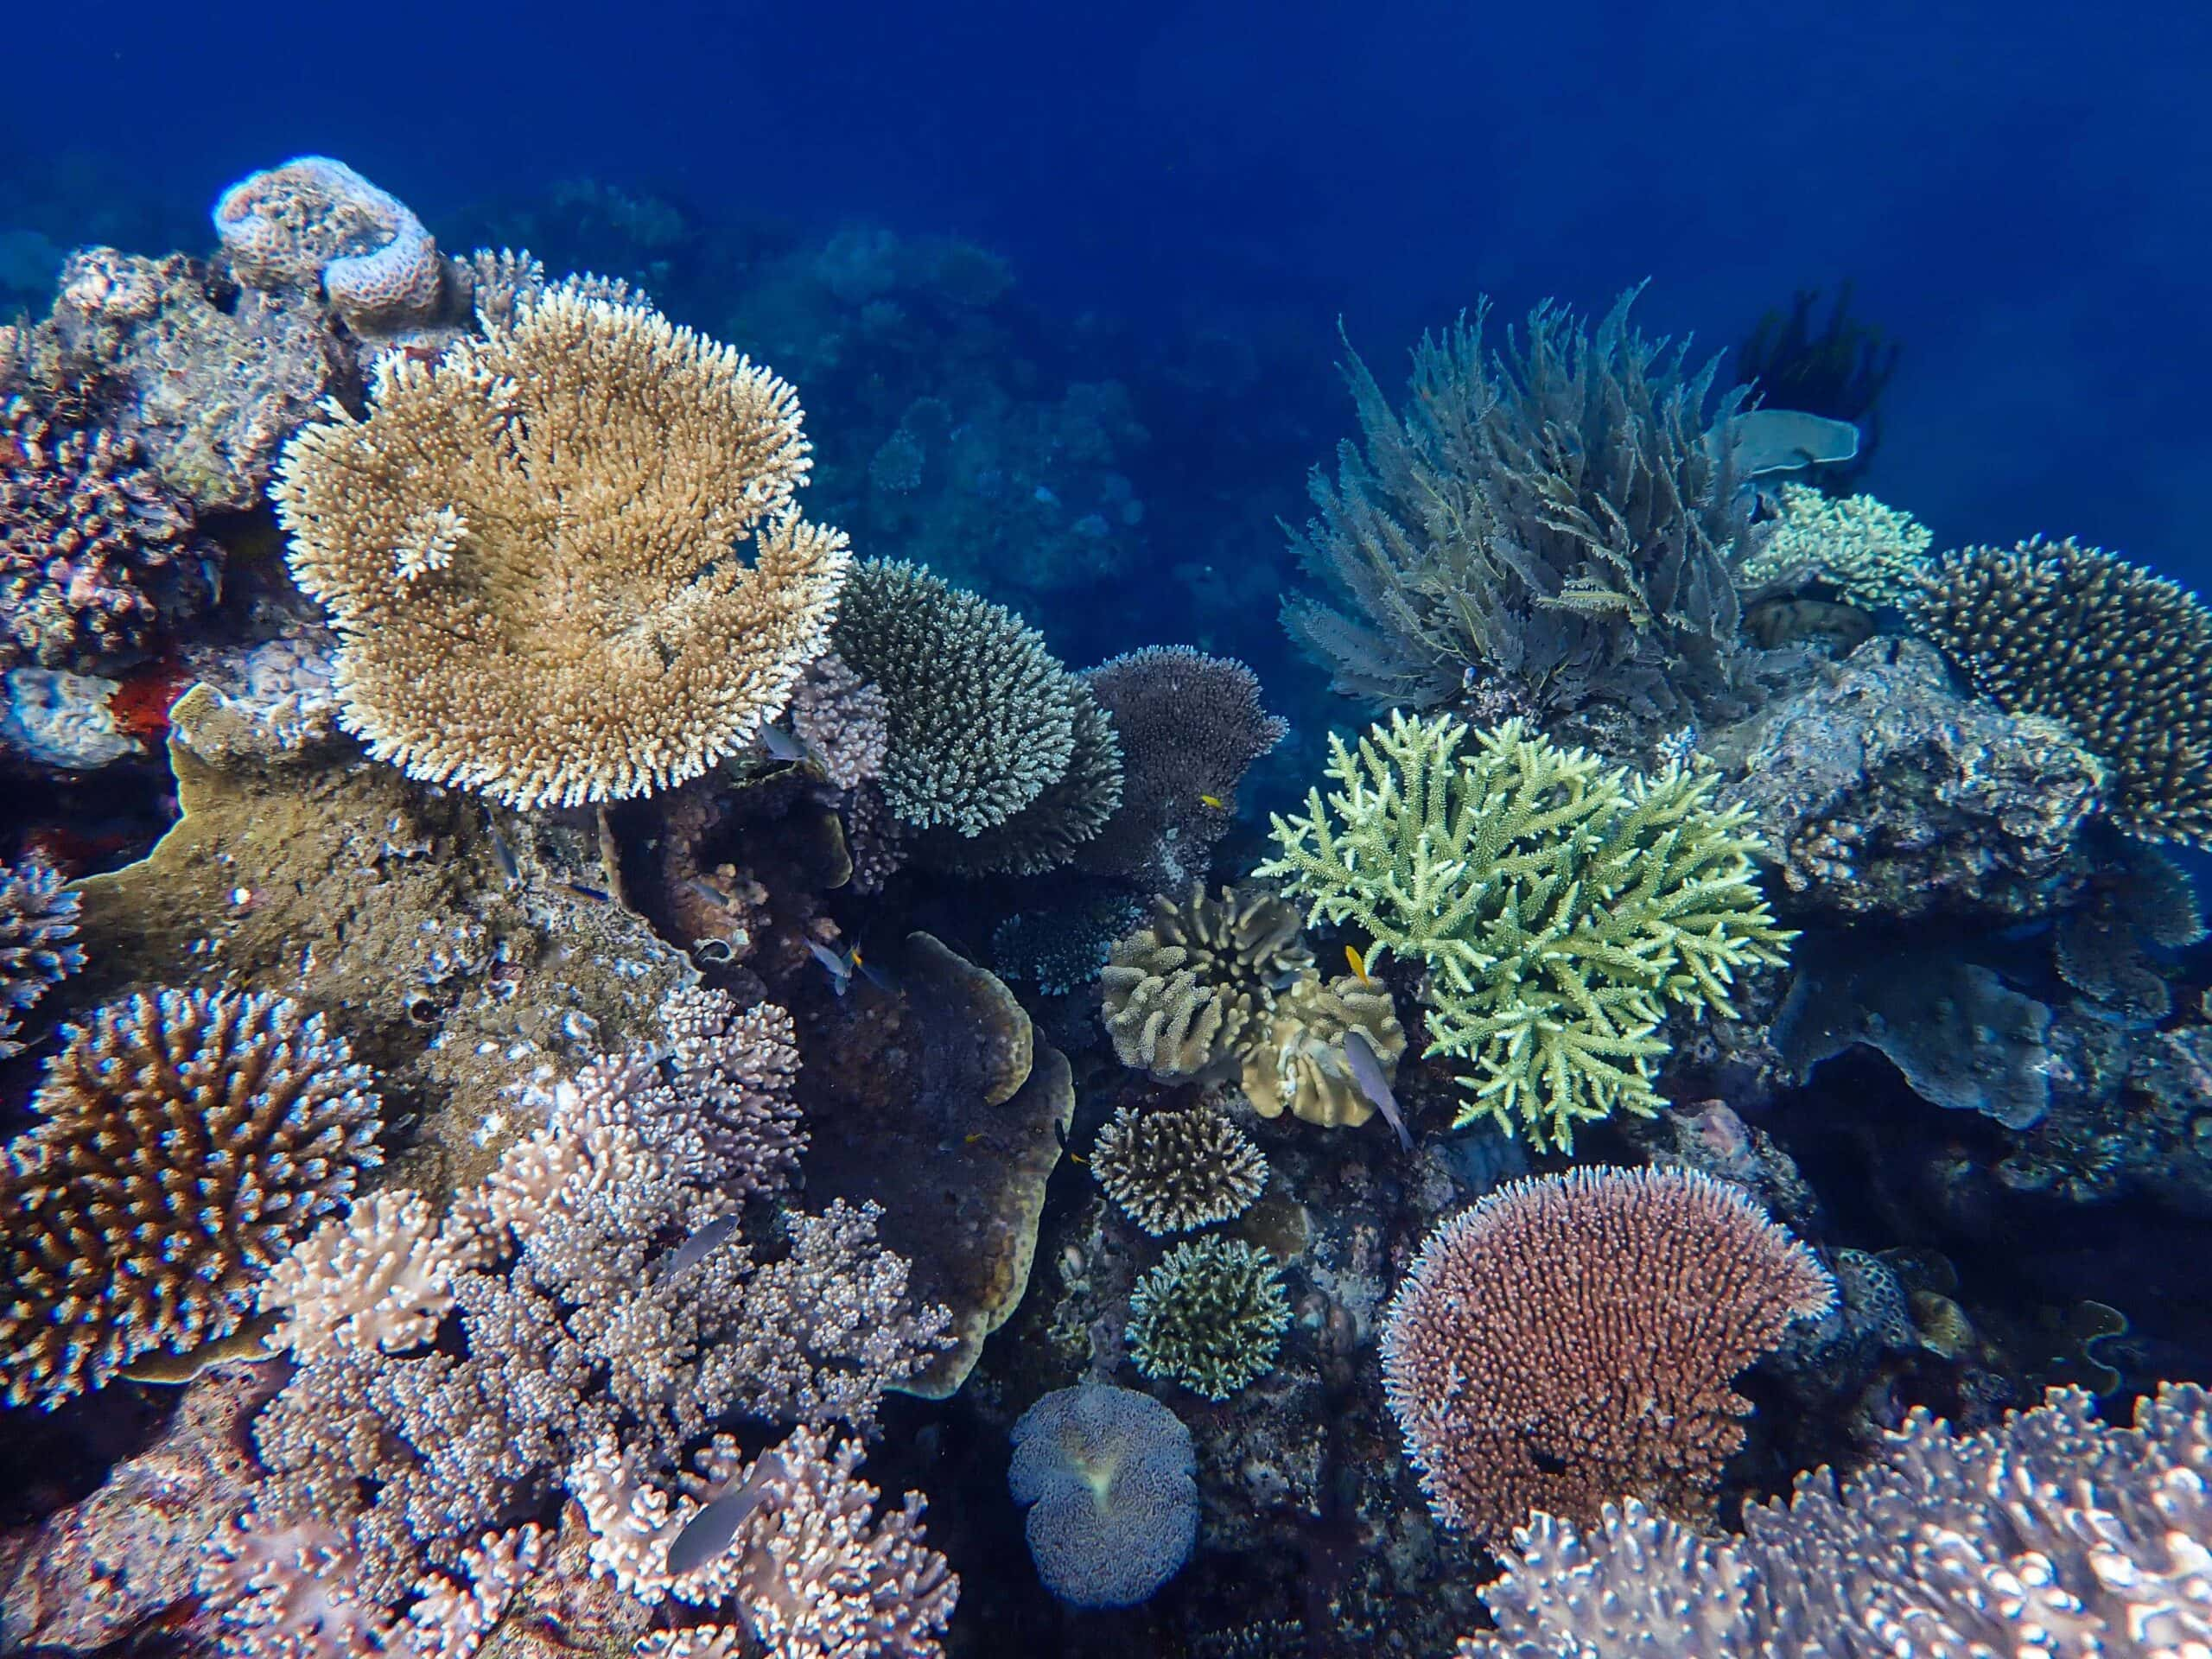 Mackay Coral Cay Reef Brooke